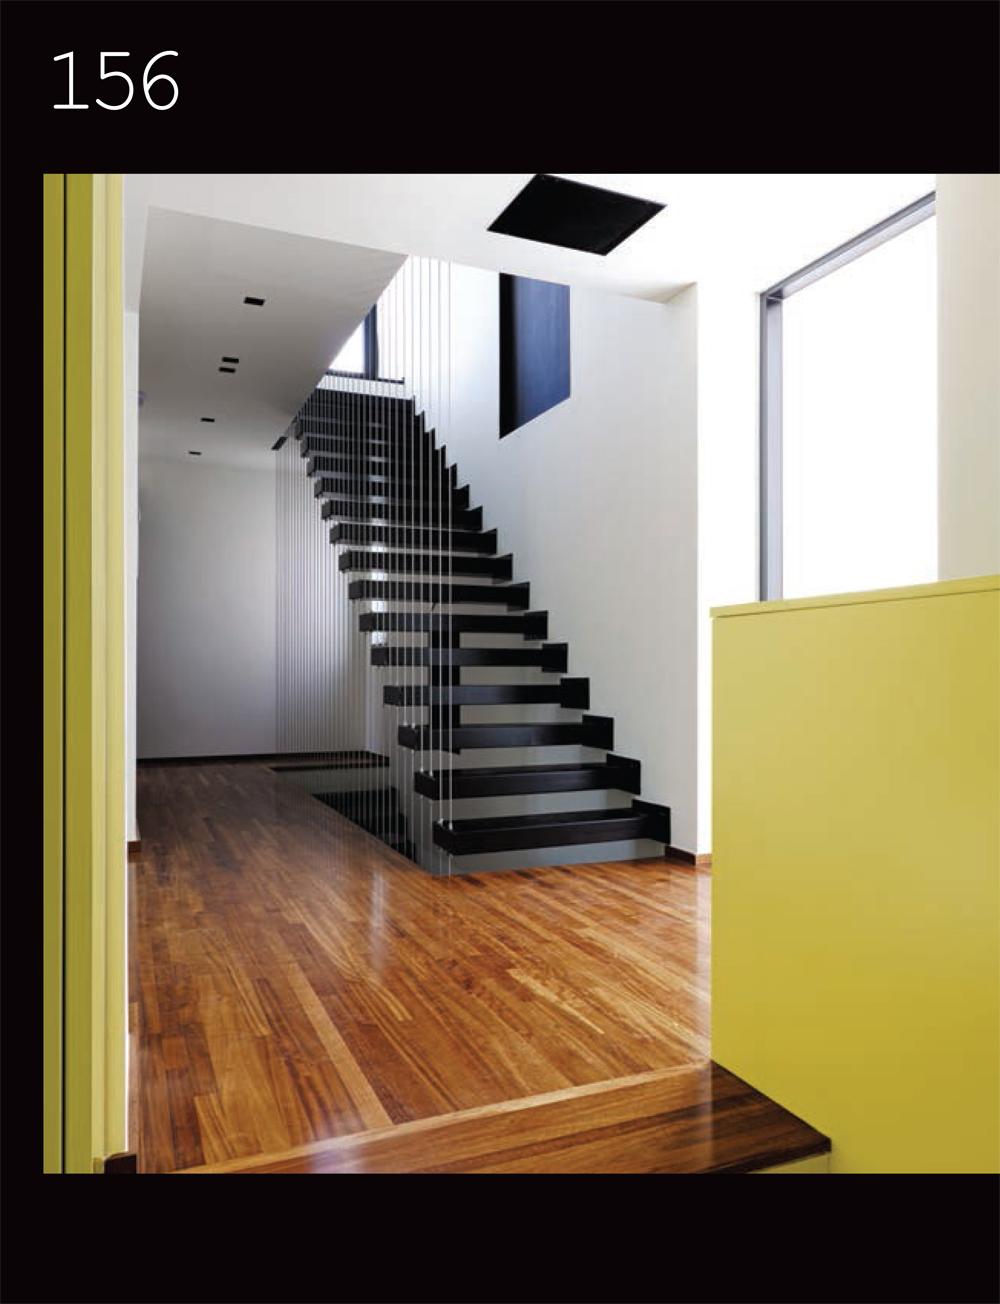 149_161_BoH_Dream_house-8.jpg